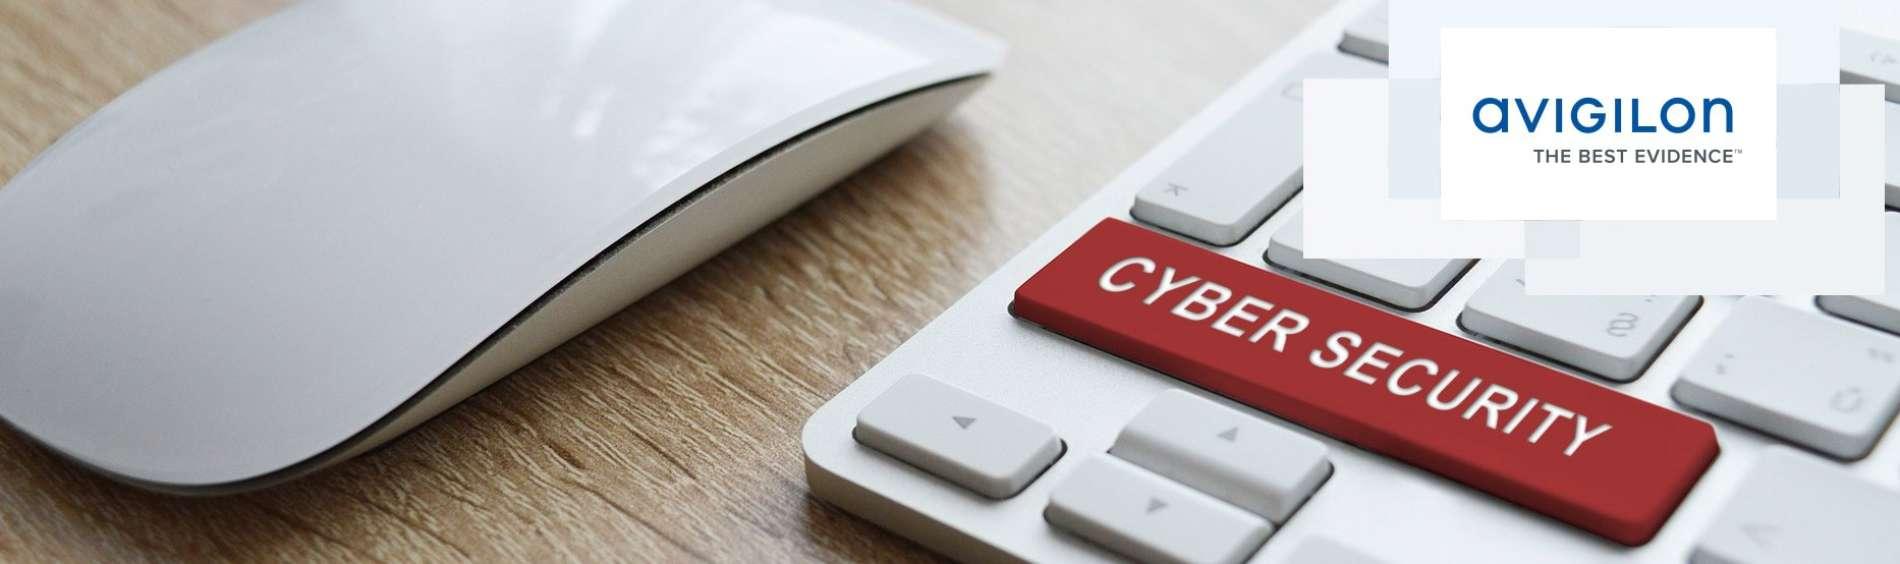 Avigilon : Bescherming tegen Cyber-aanvallen